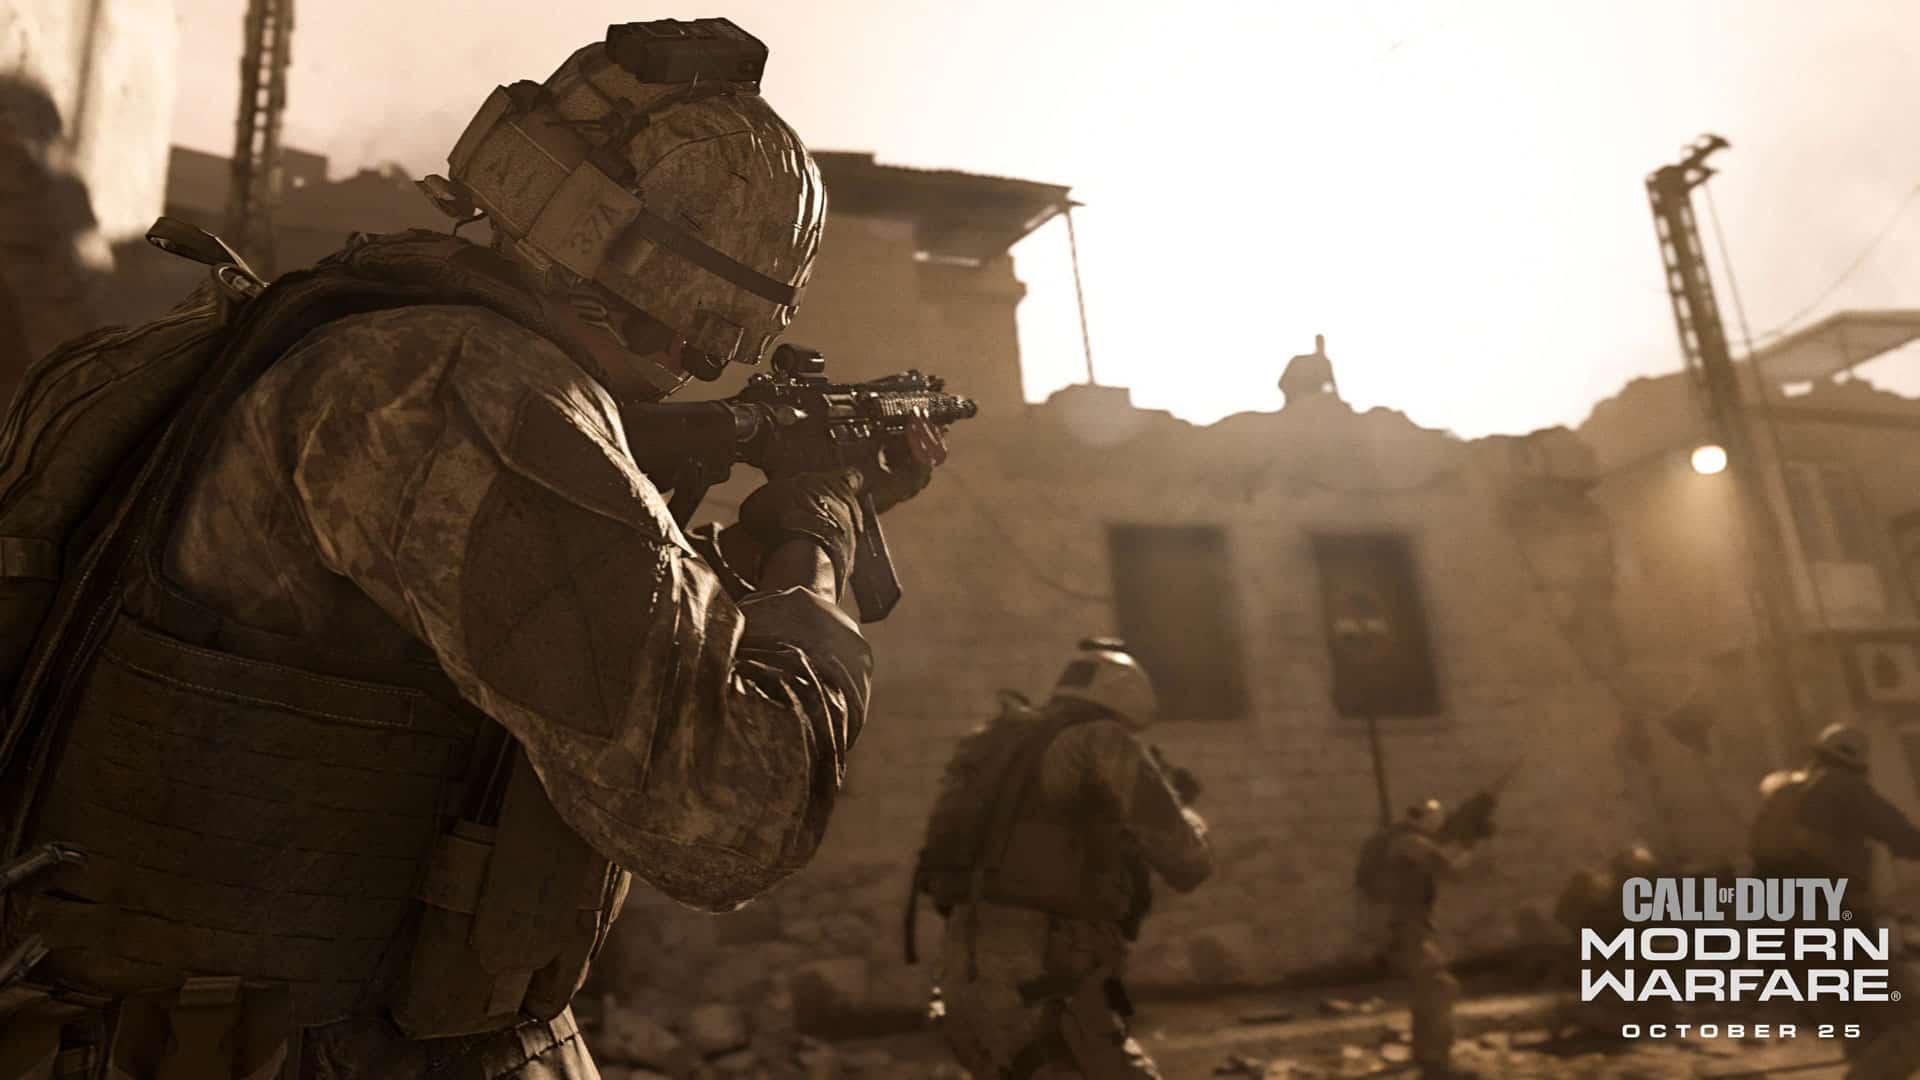 Call of Duty: Modern Warfare update 1.09